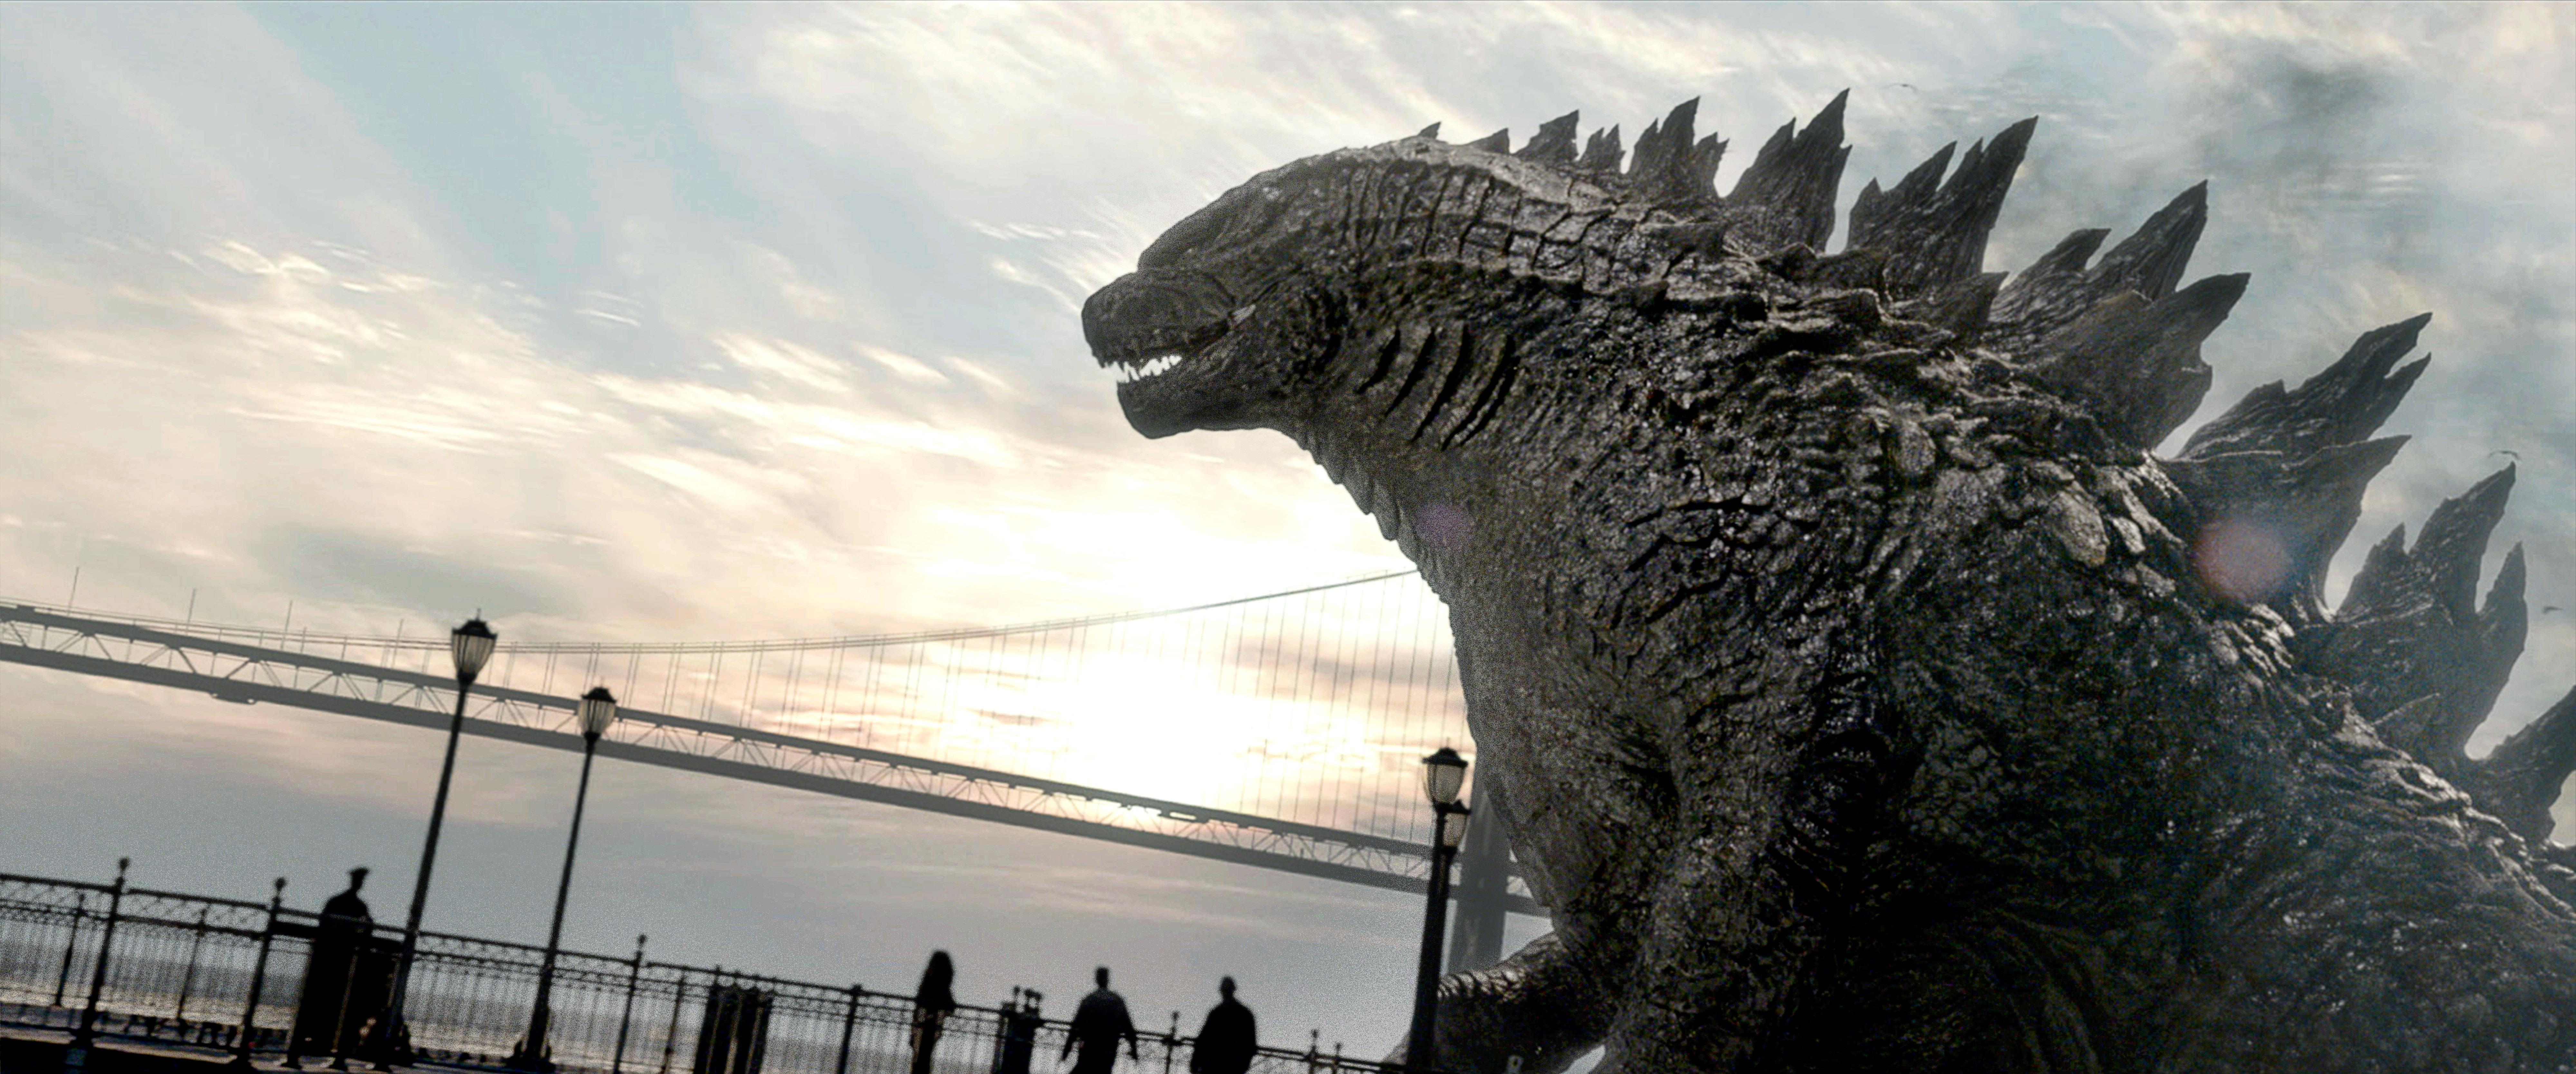 Godzilla 2014   HD Photos   Godzilla Photo 37027731 8000x3335